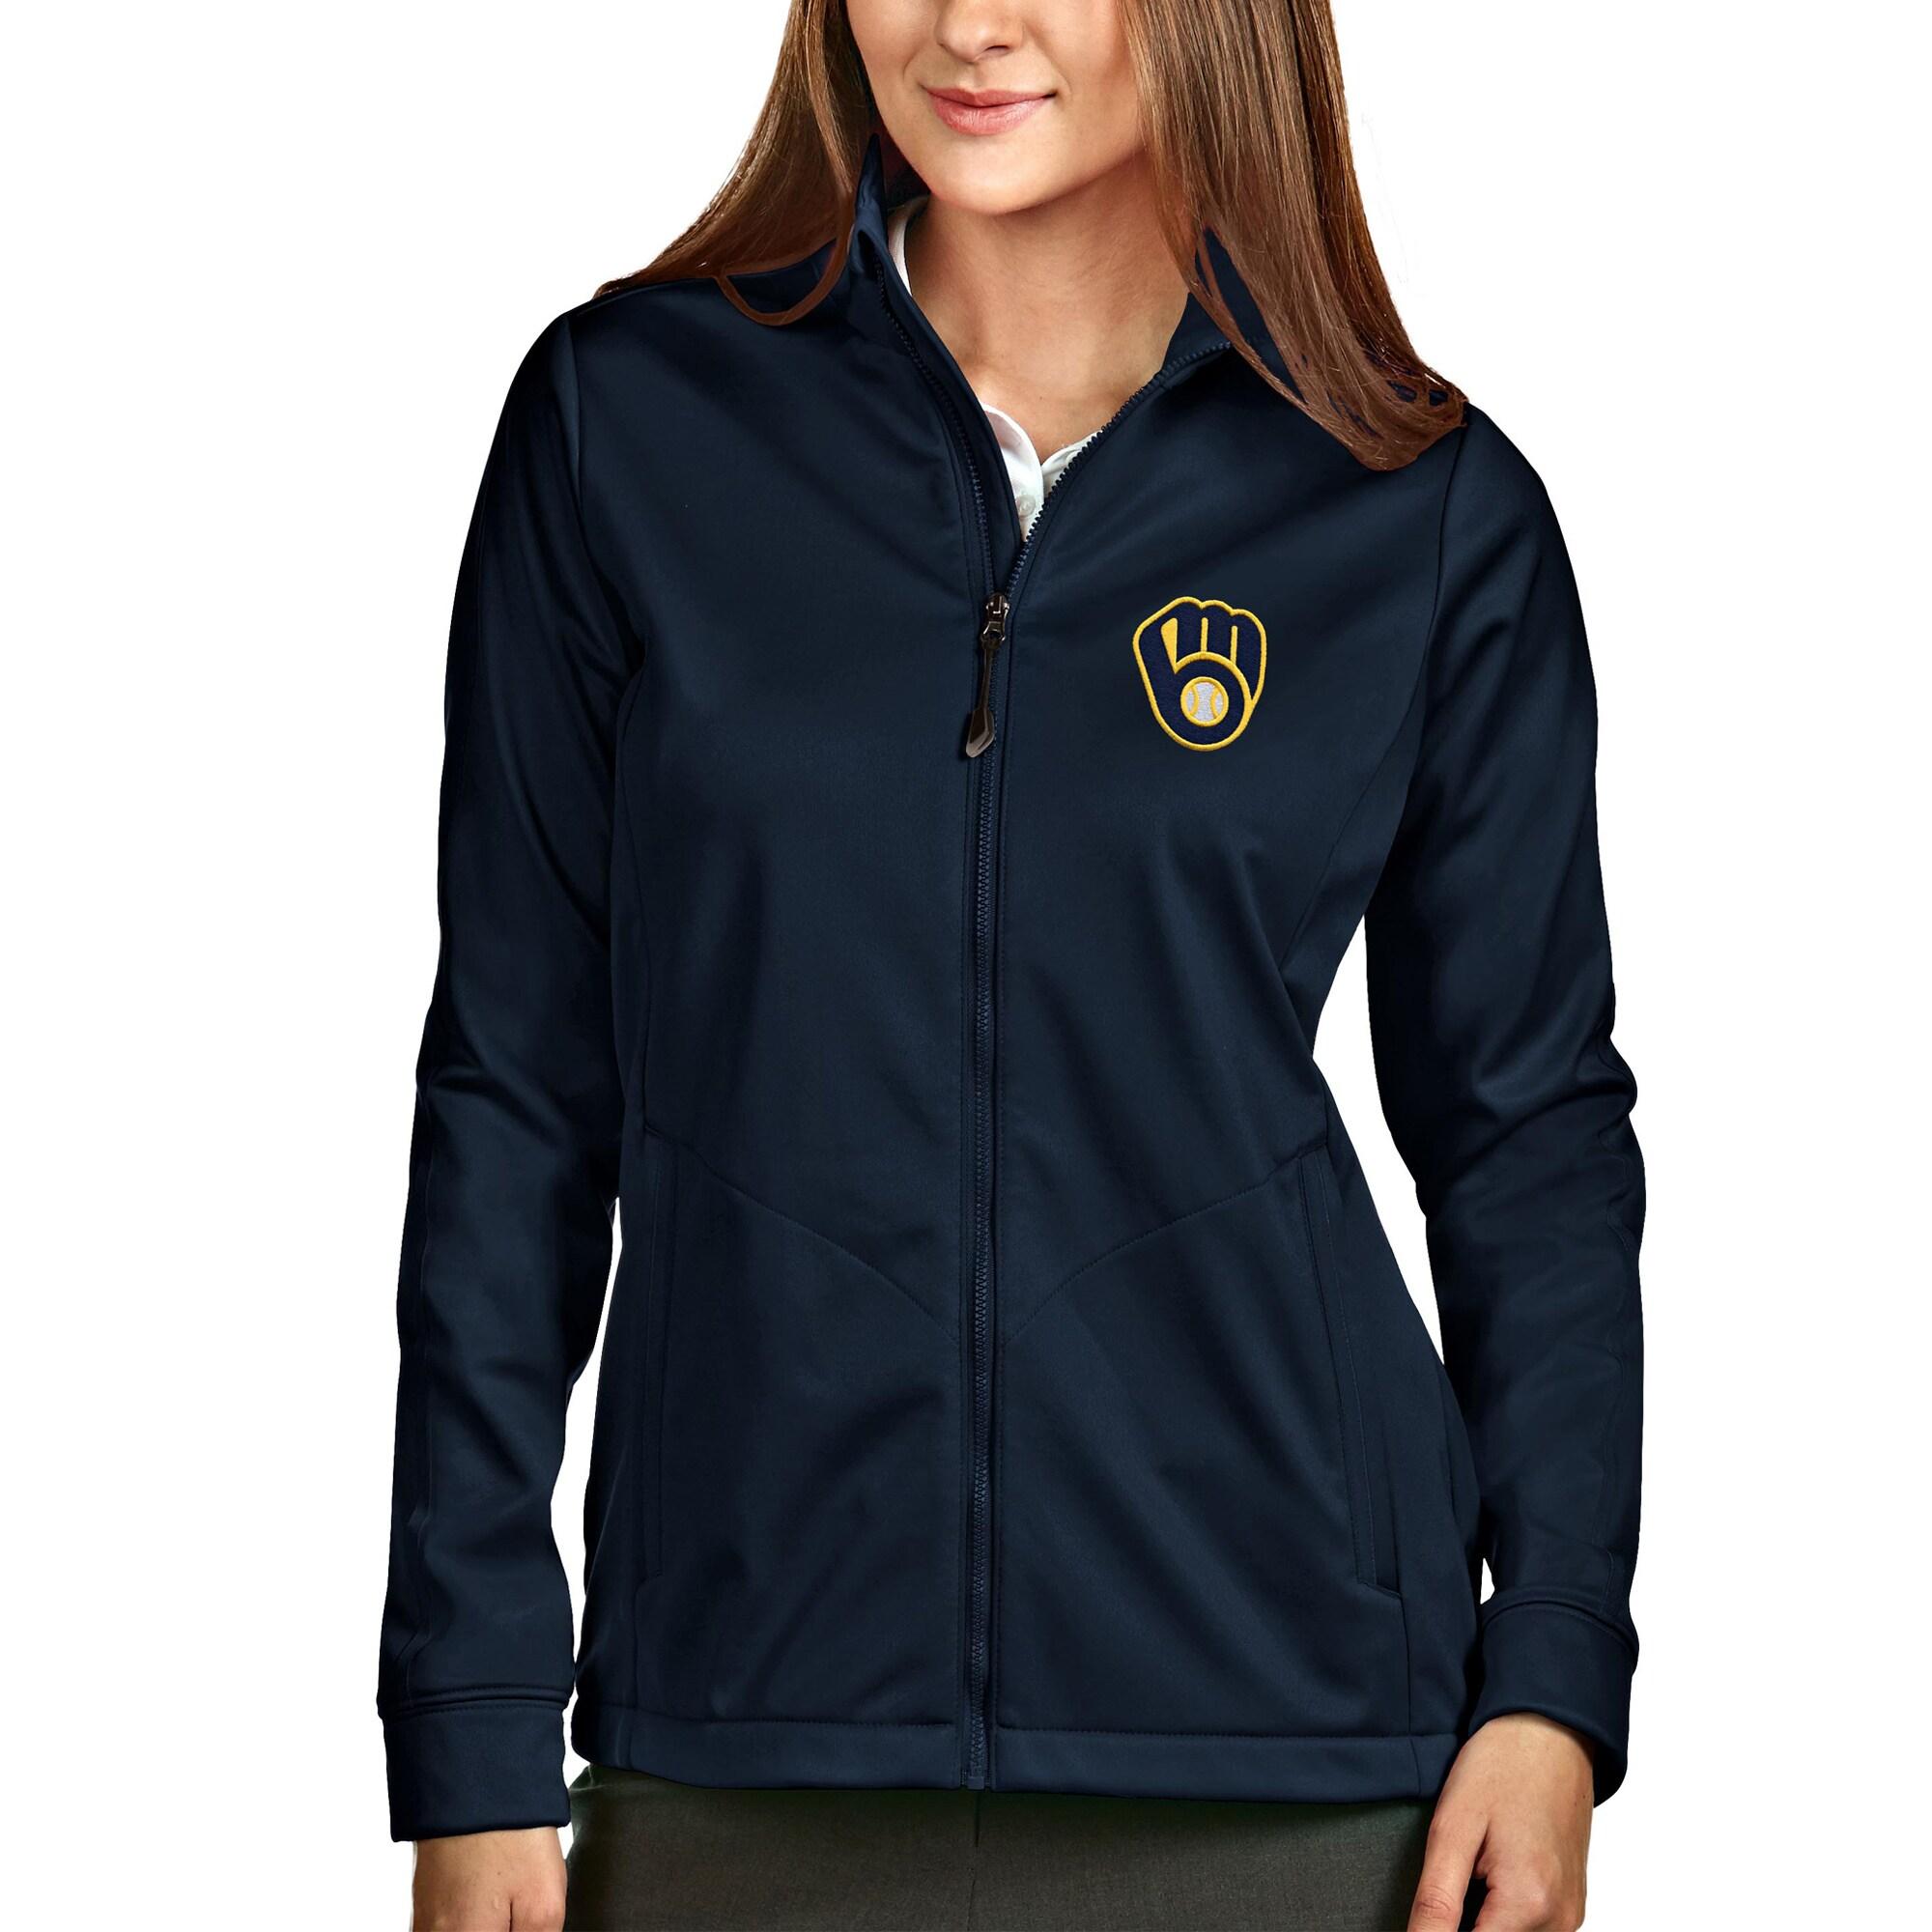 Milwaukee Brewers Antigua Women's Full-Zip Golf Jacket - Navy